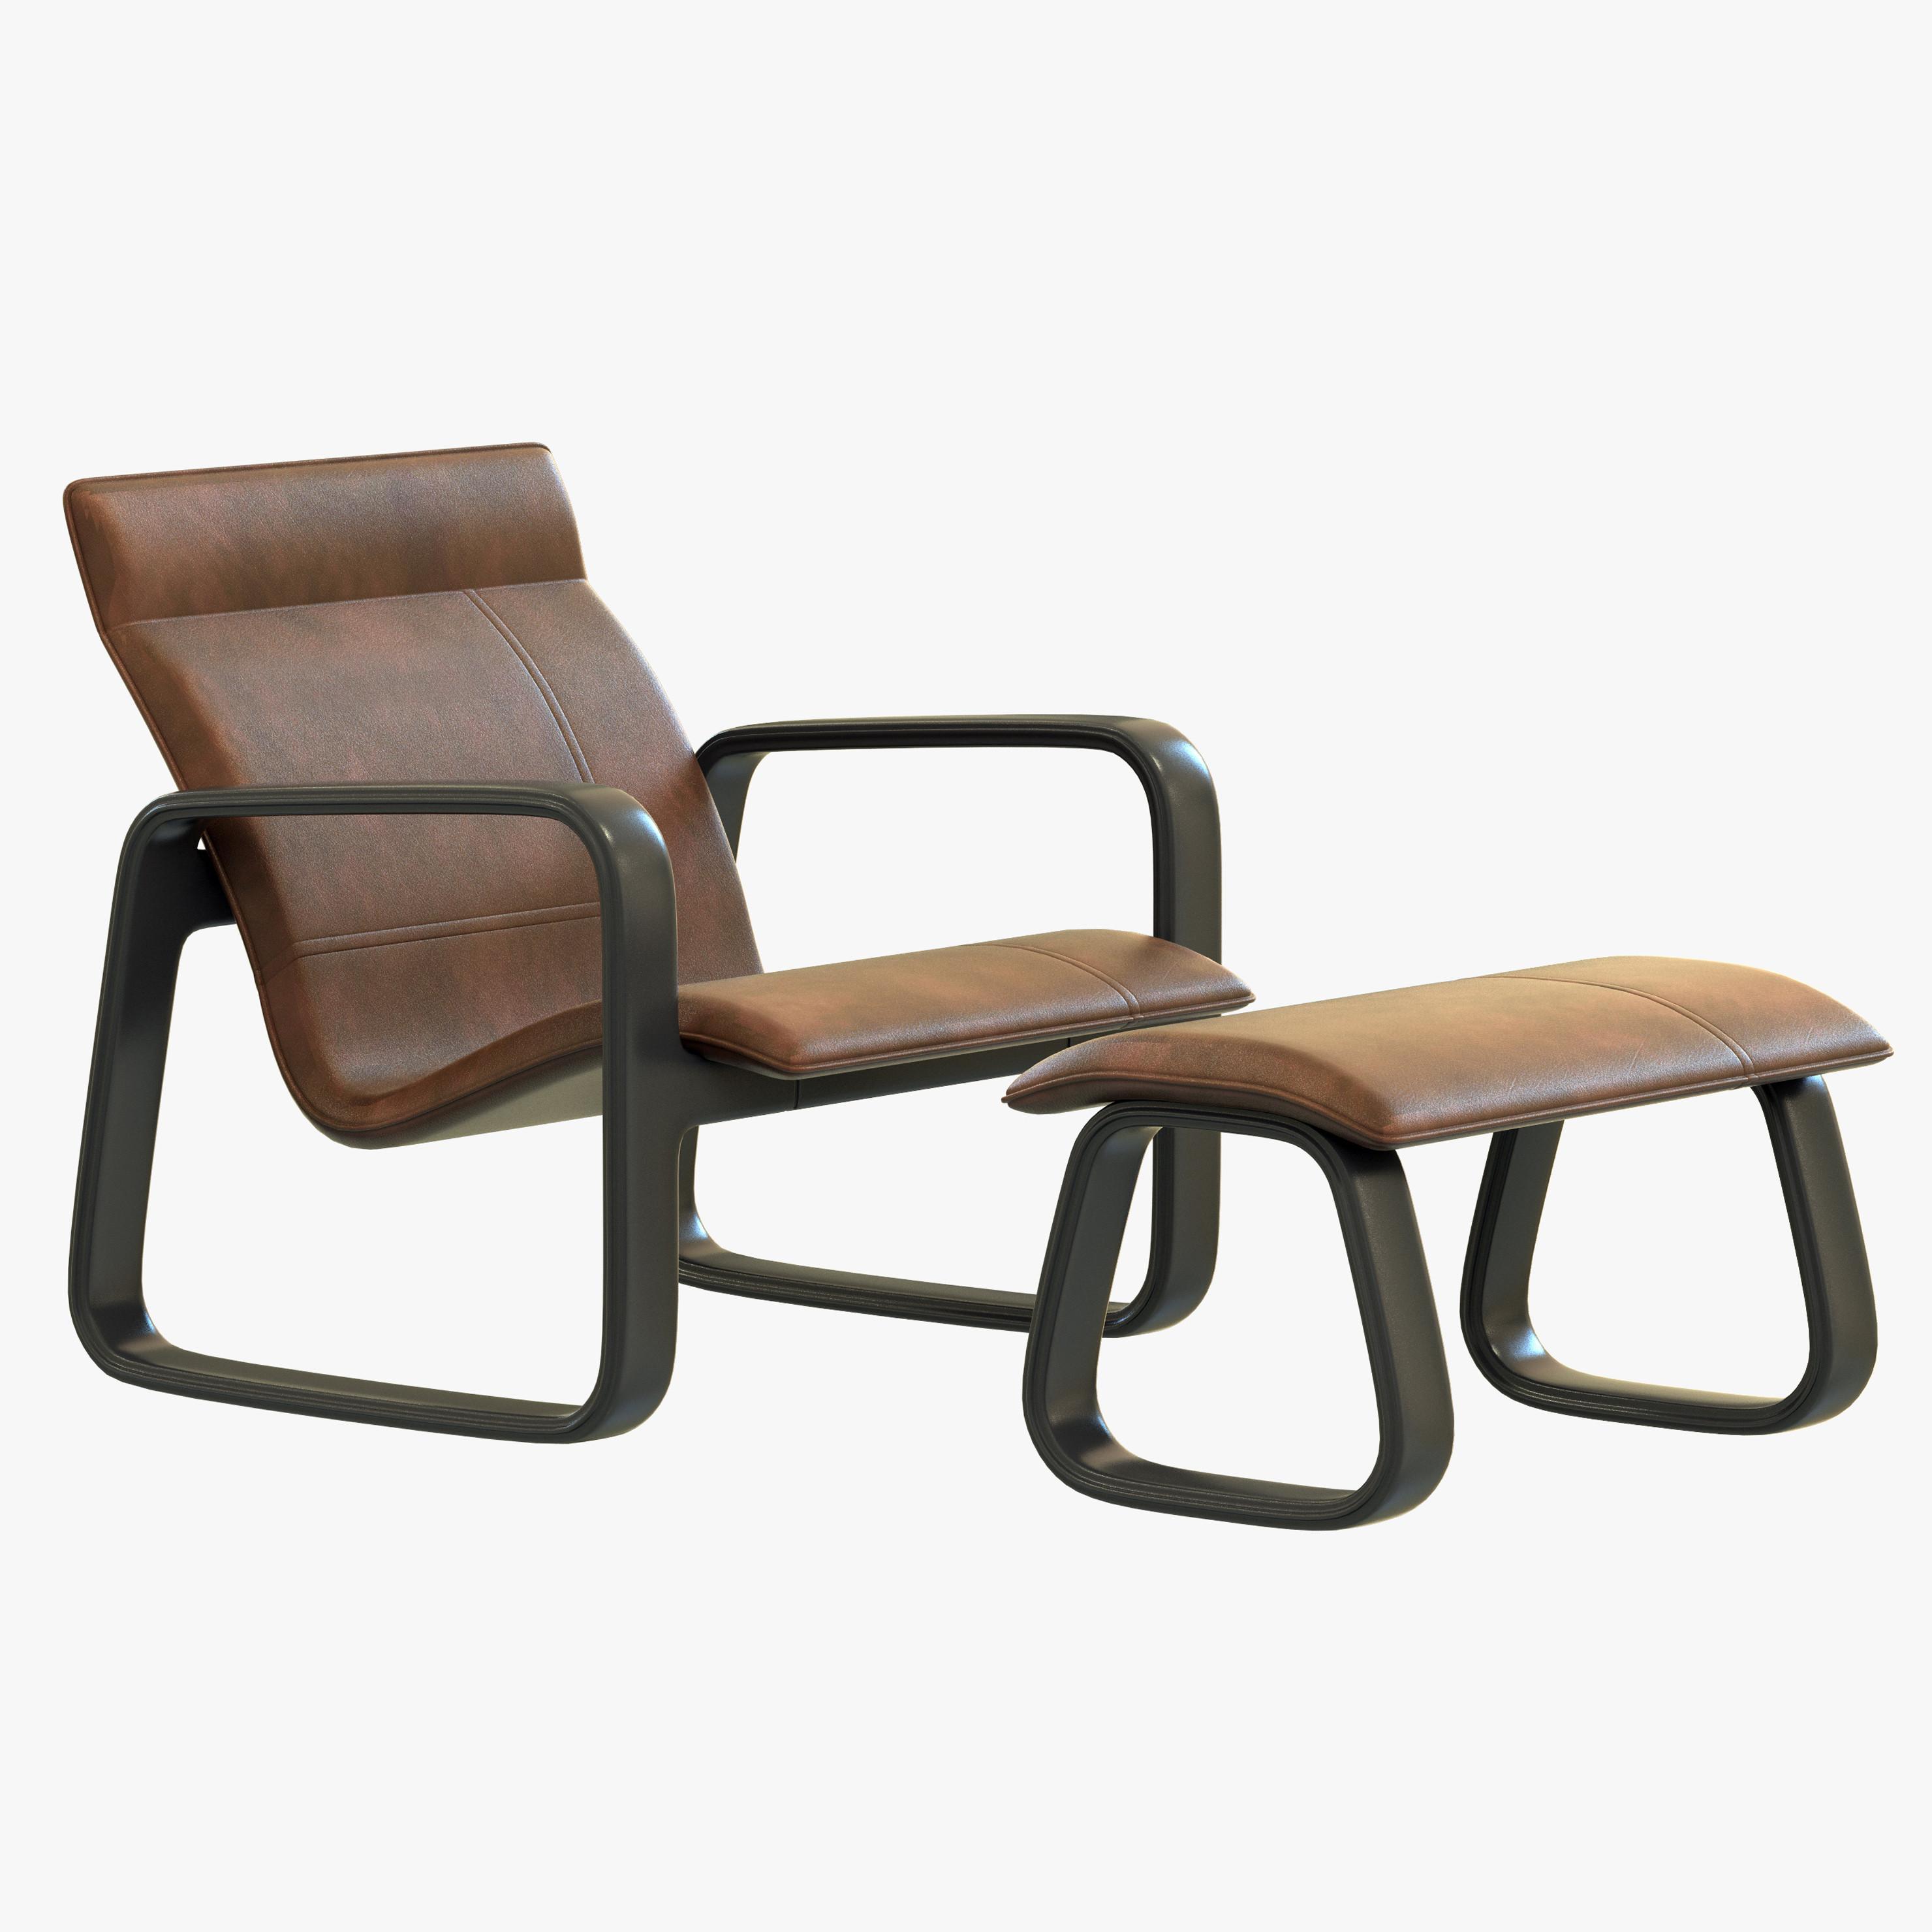 3d model baxter nubi chaise for Chaise quadriceps